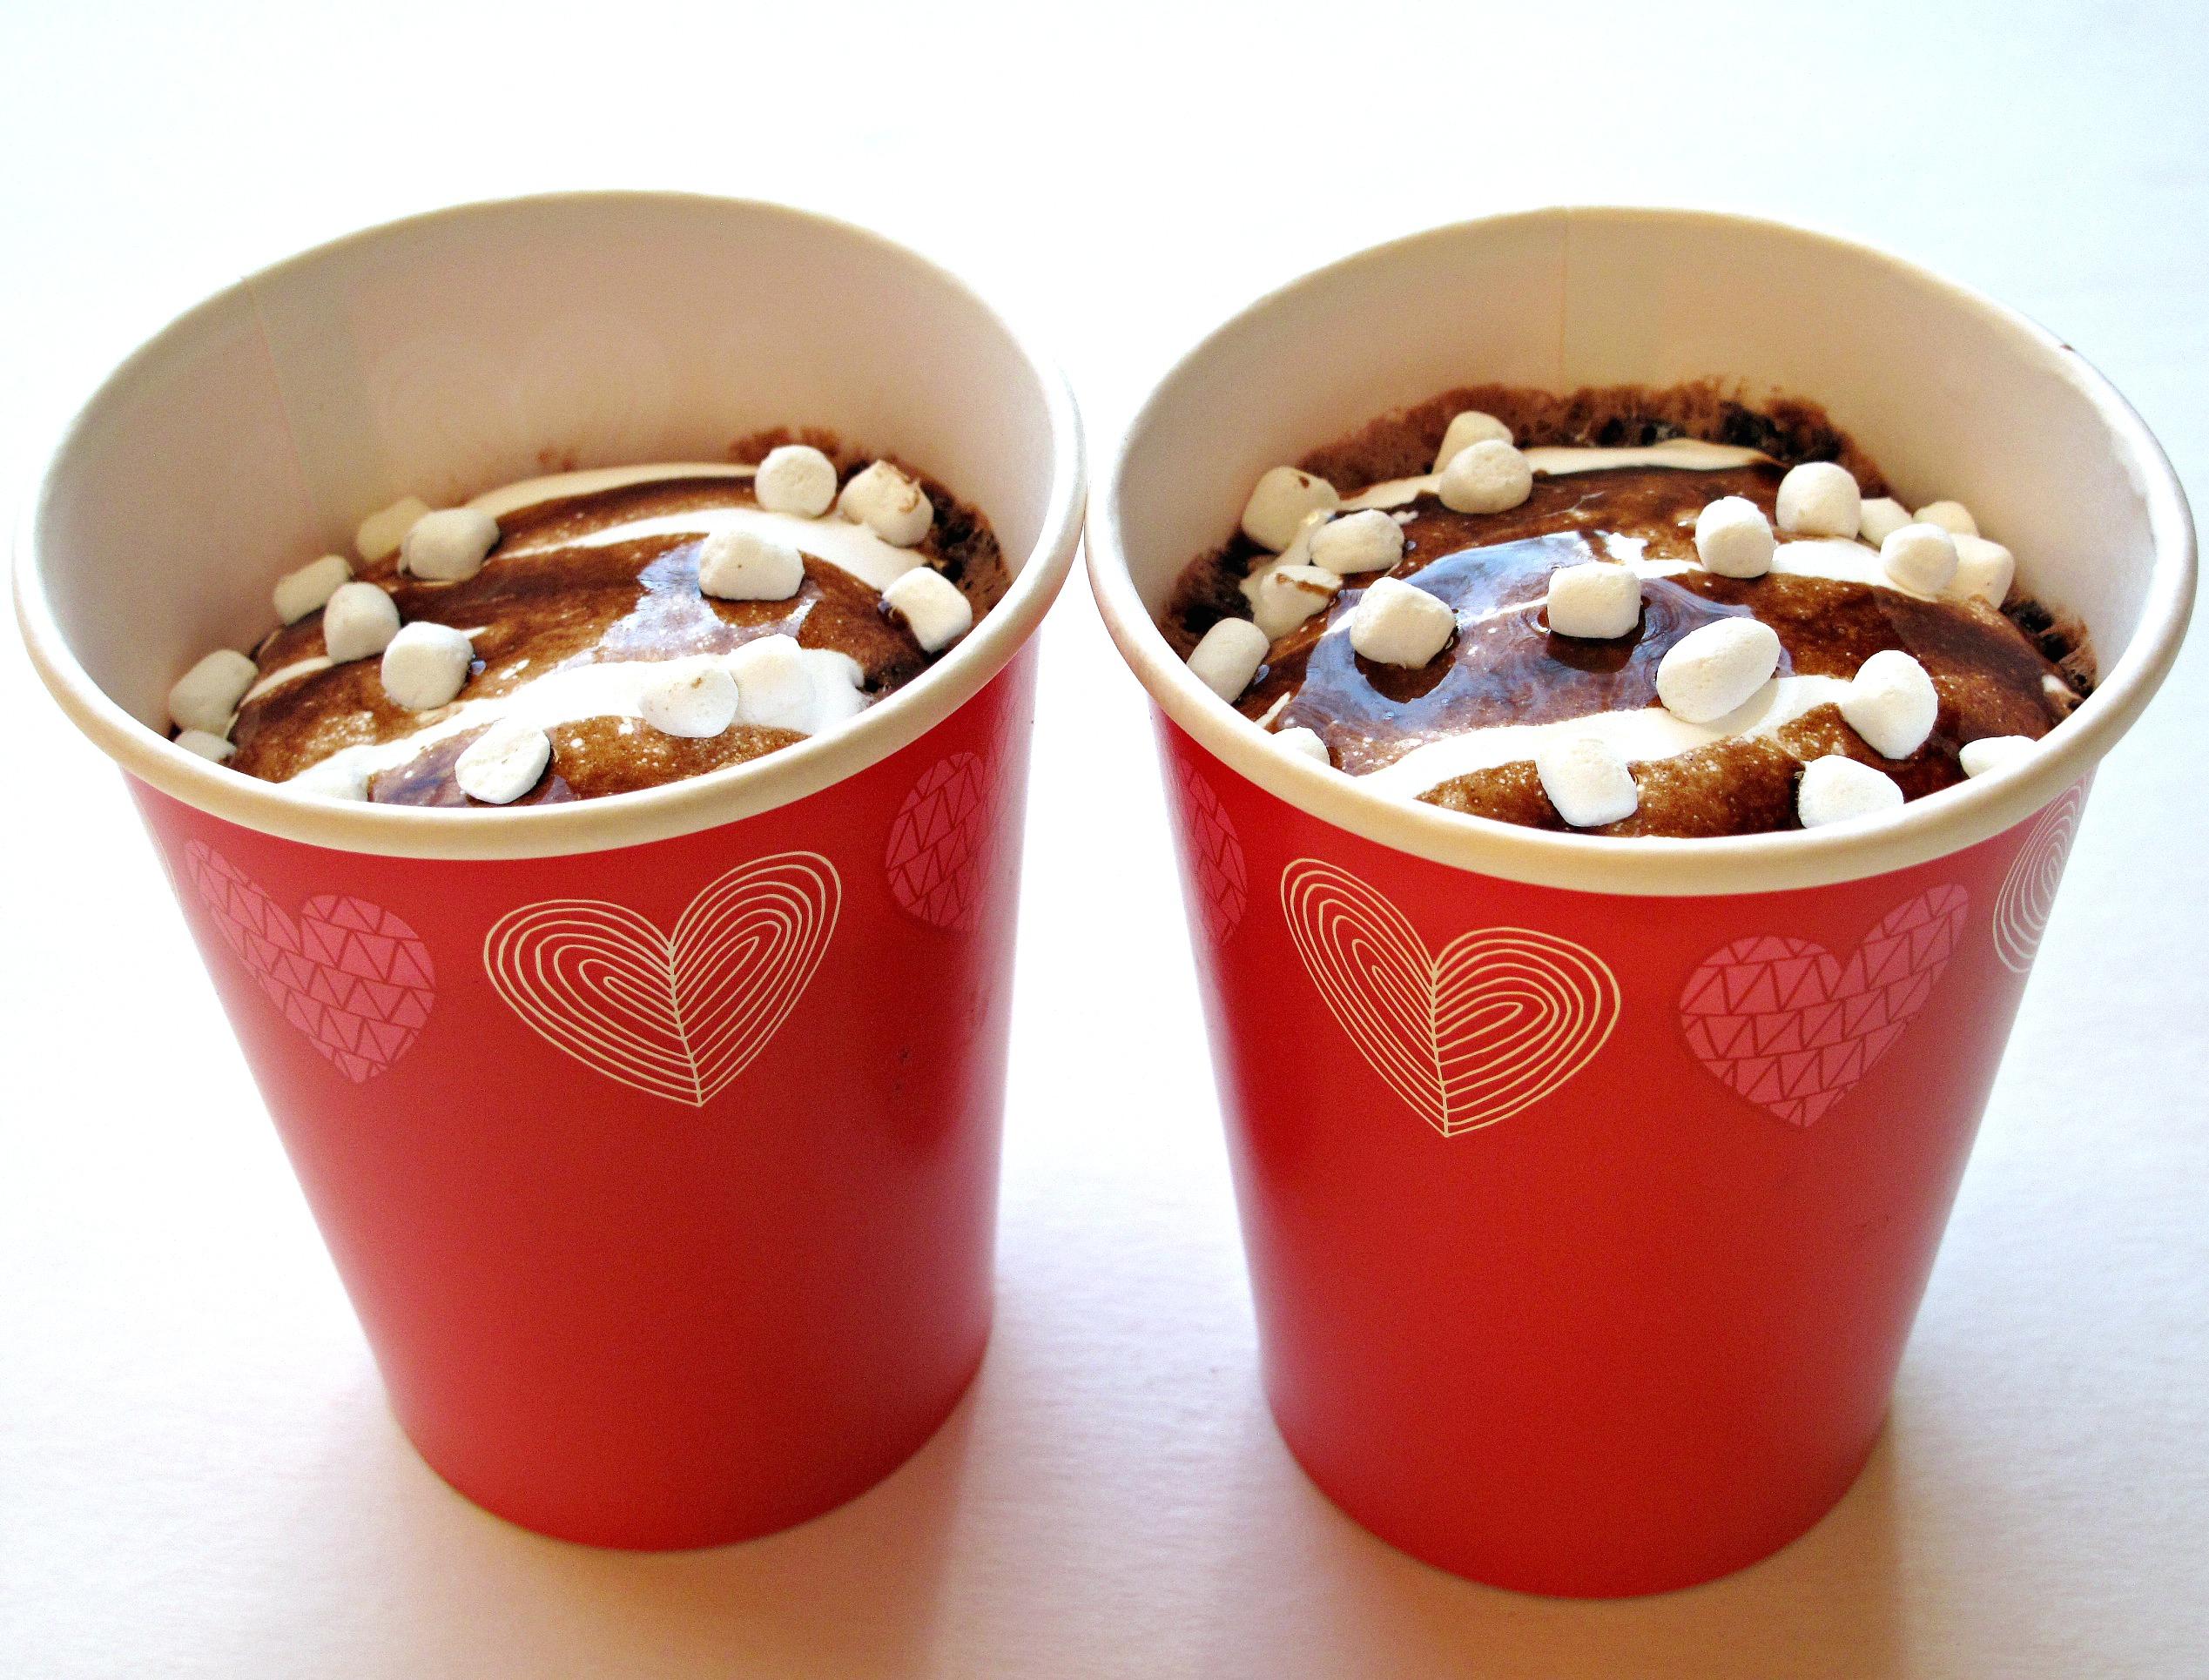 Hot Chocolate Mug - Pumpkin Chocolate Chip Cookies